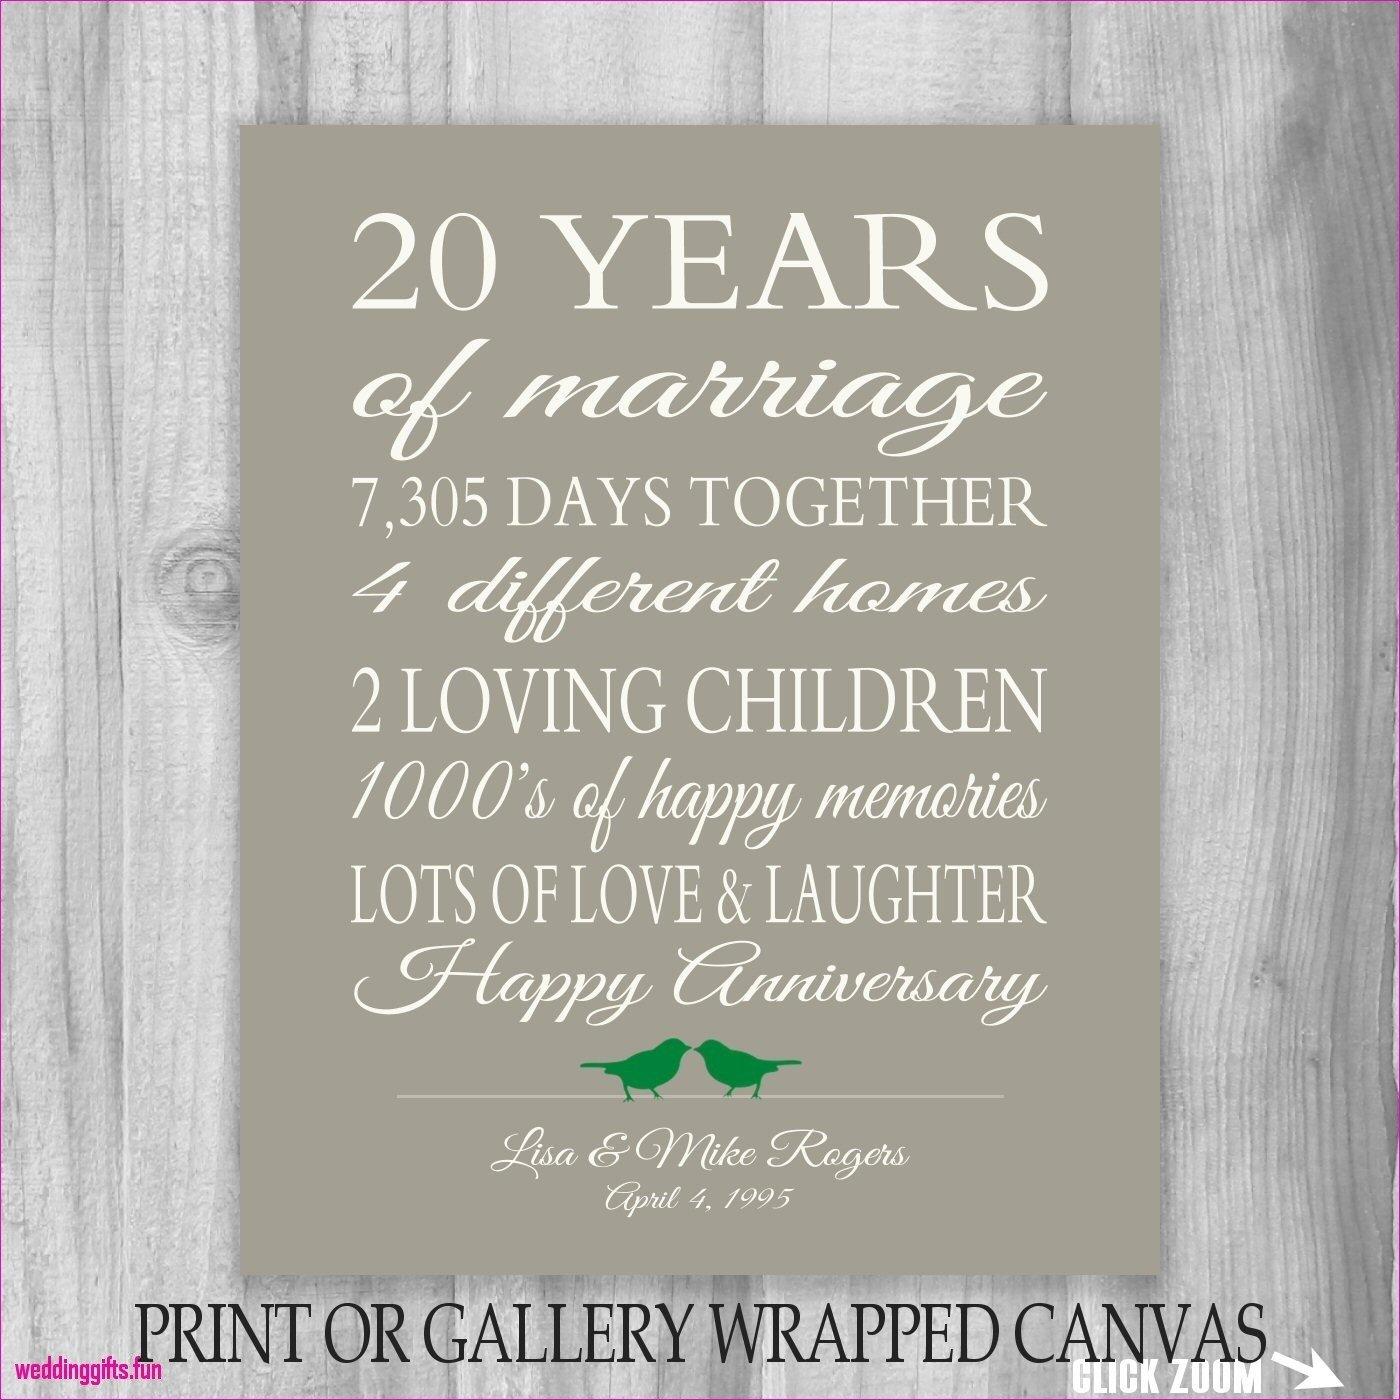 10 Stylish 20 Year Anniversary Gift Ideas 20th wedding anniversary gift luxury fresh 20th wedding anniversary 1